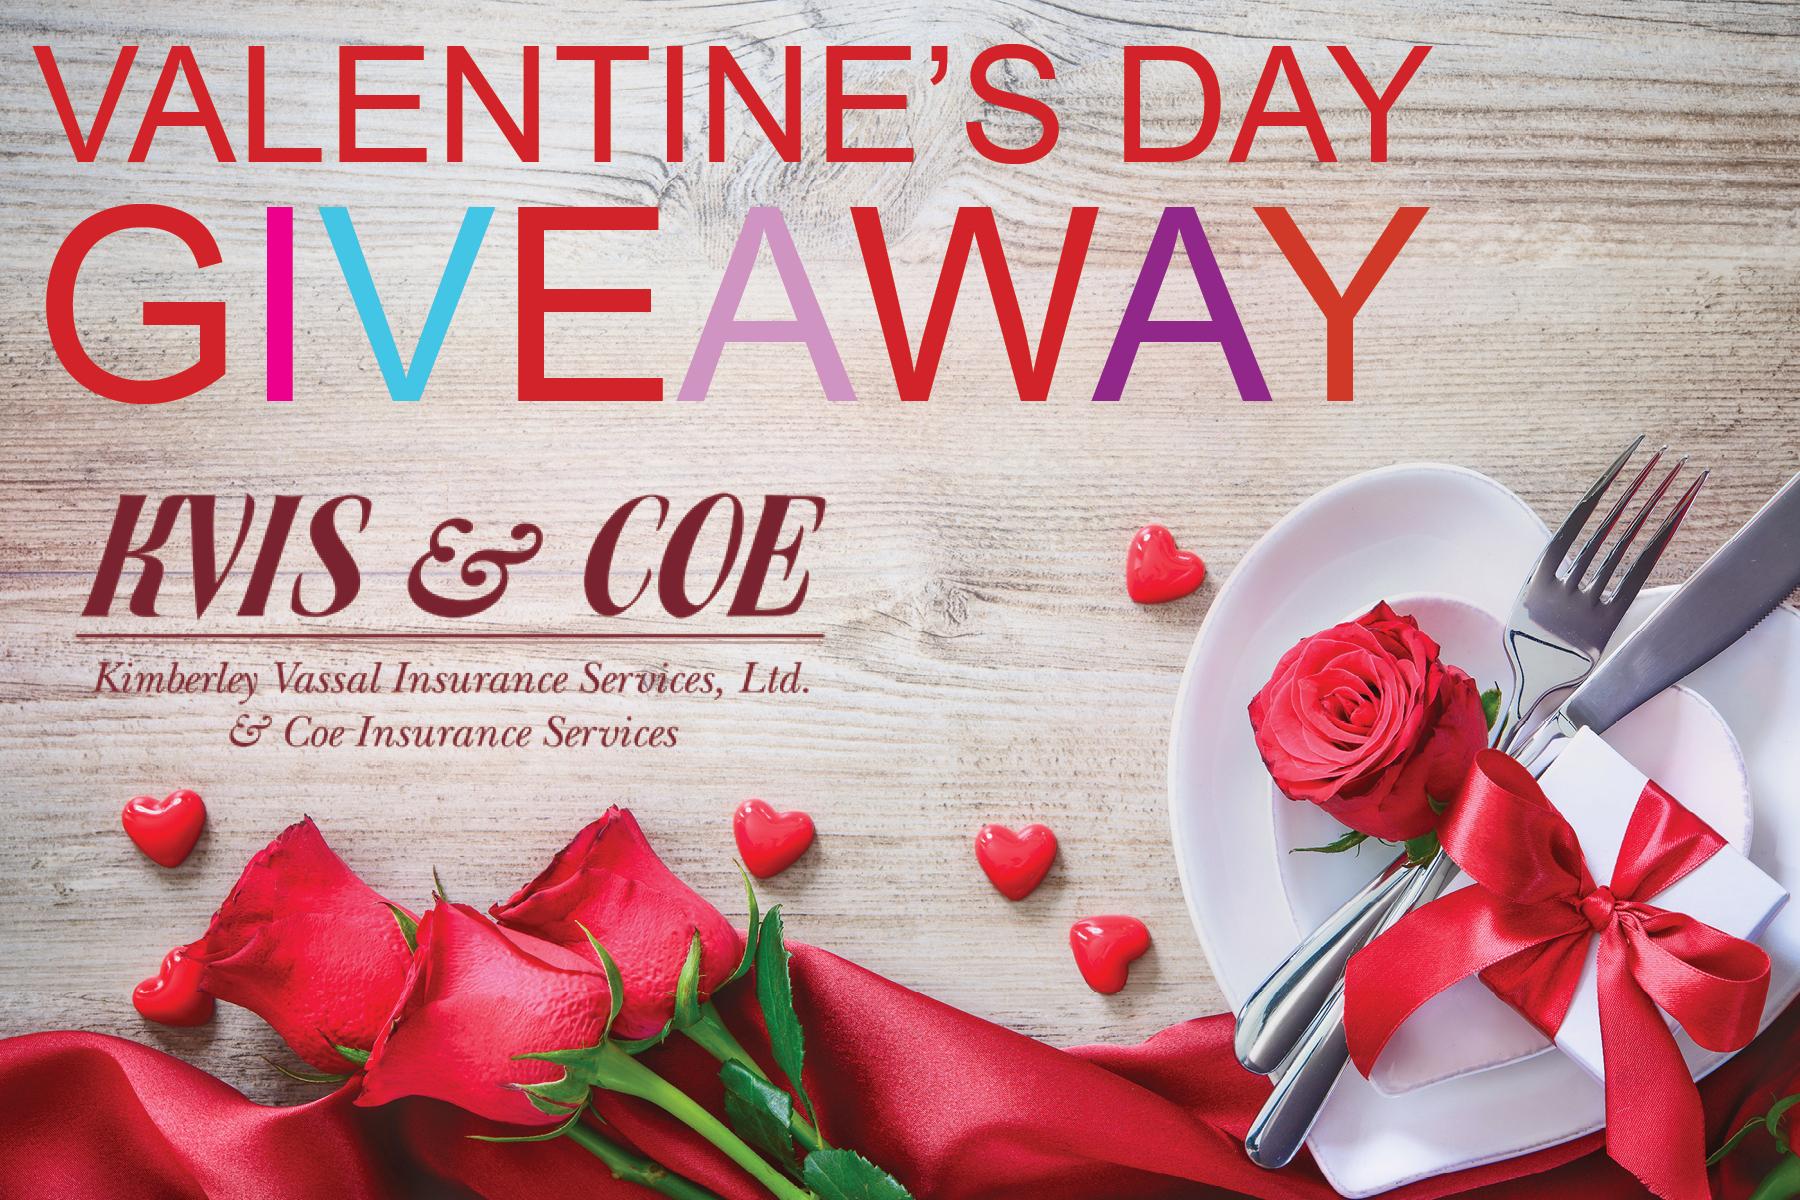 Valentines day offer 2021 kvis&coe